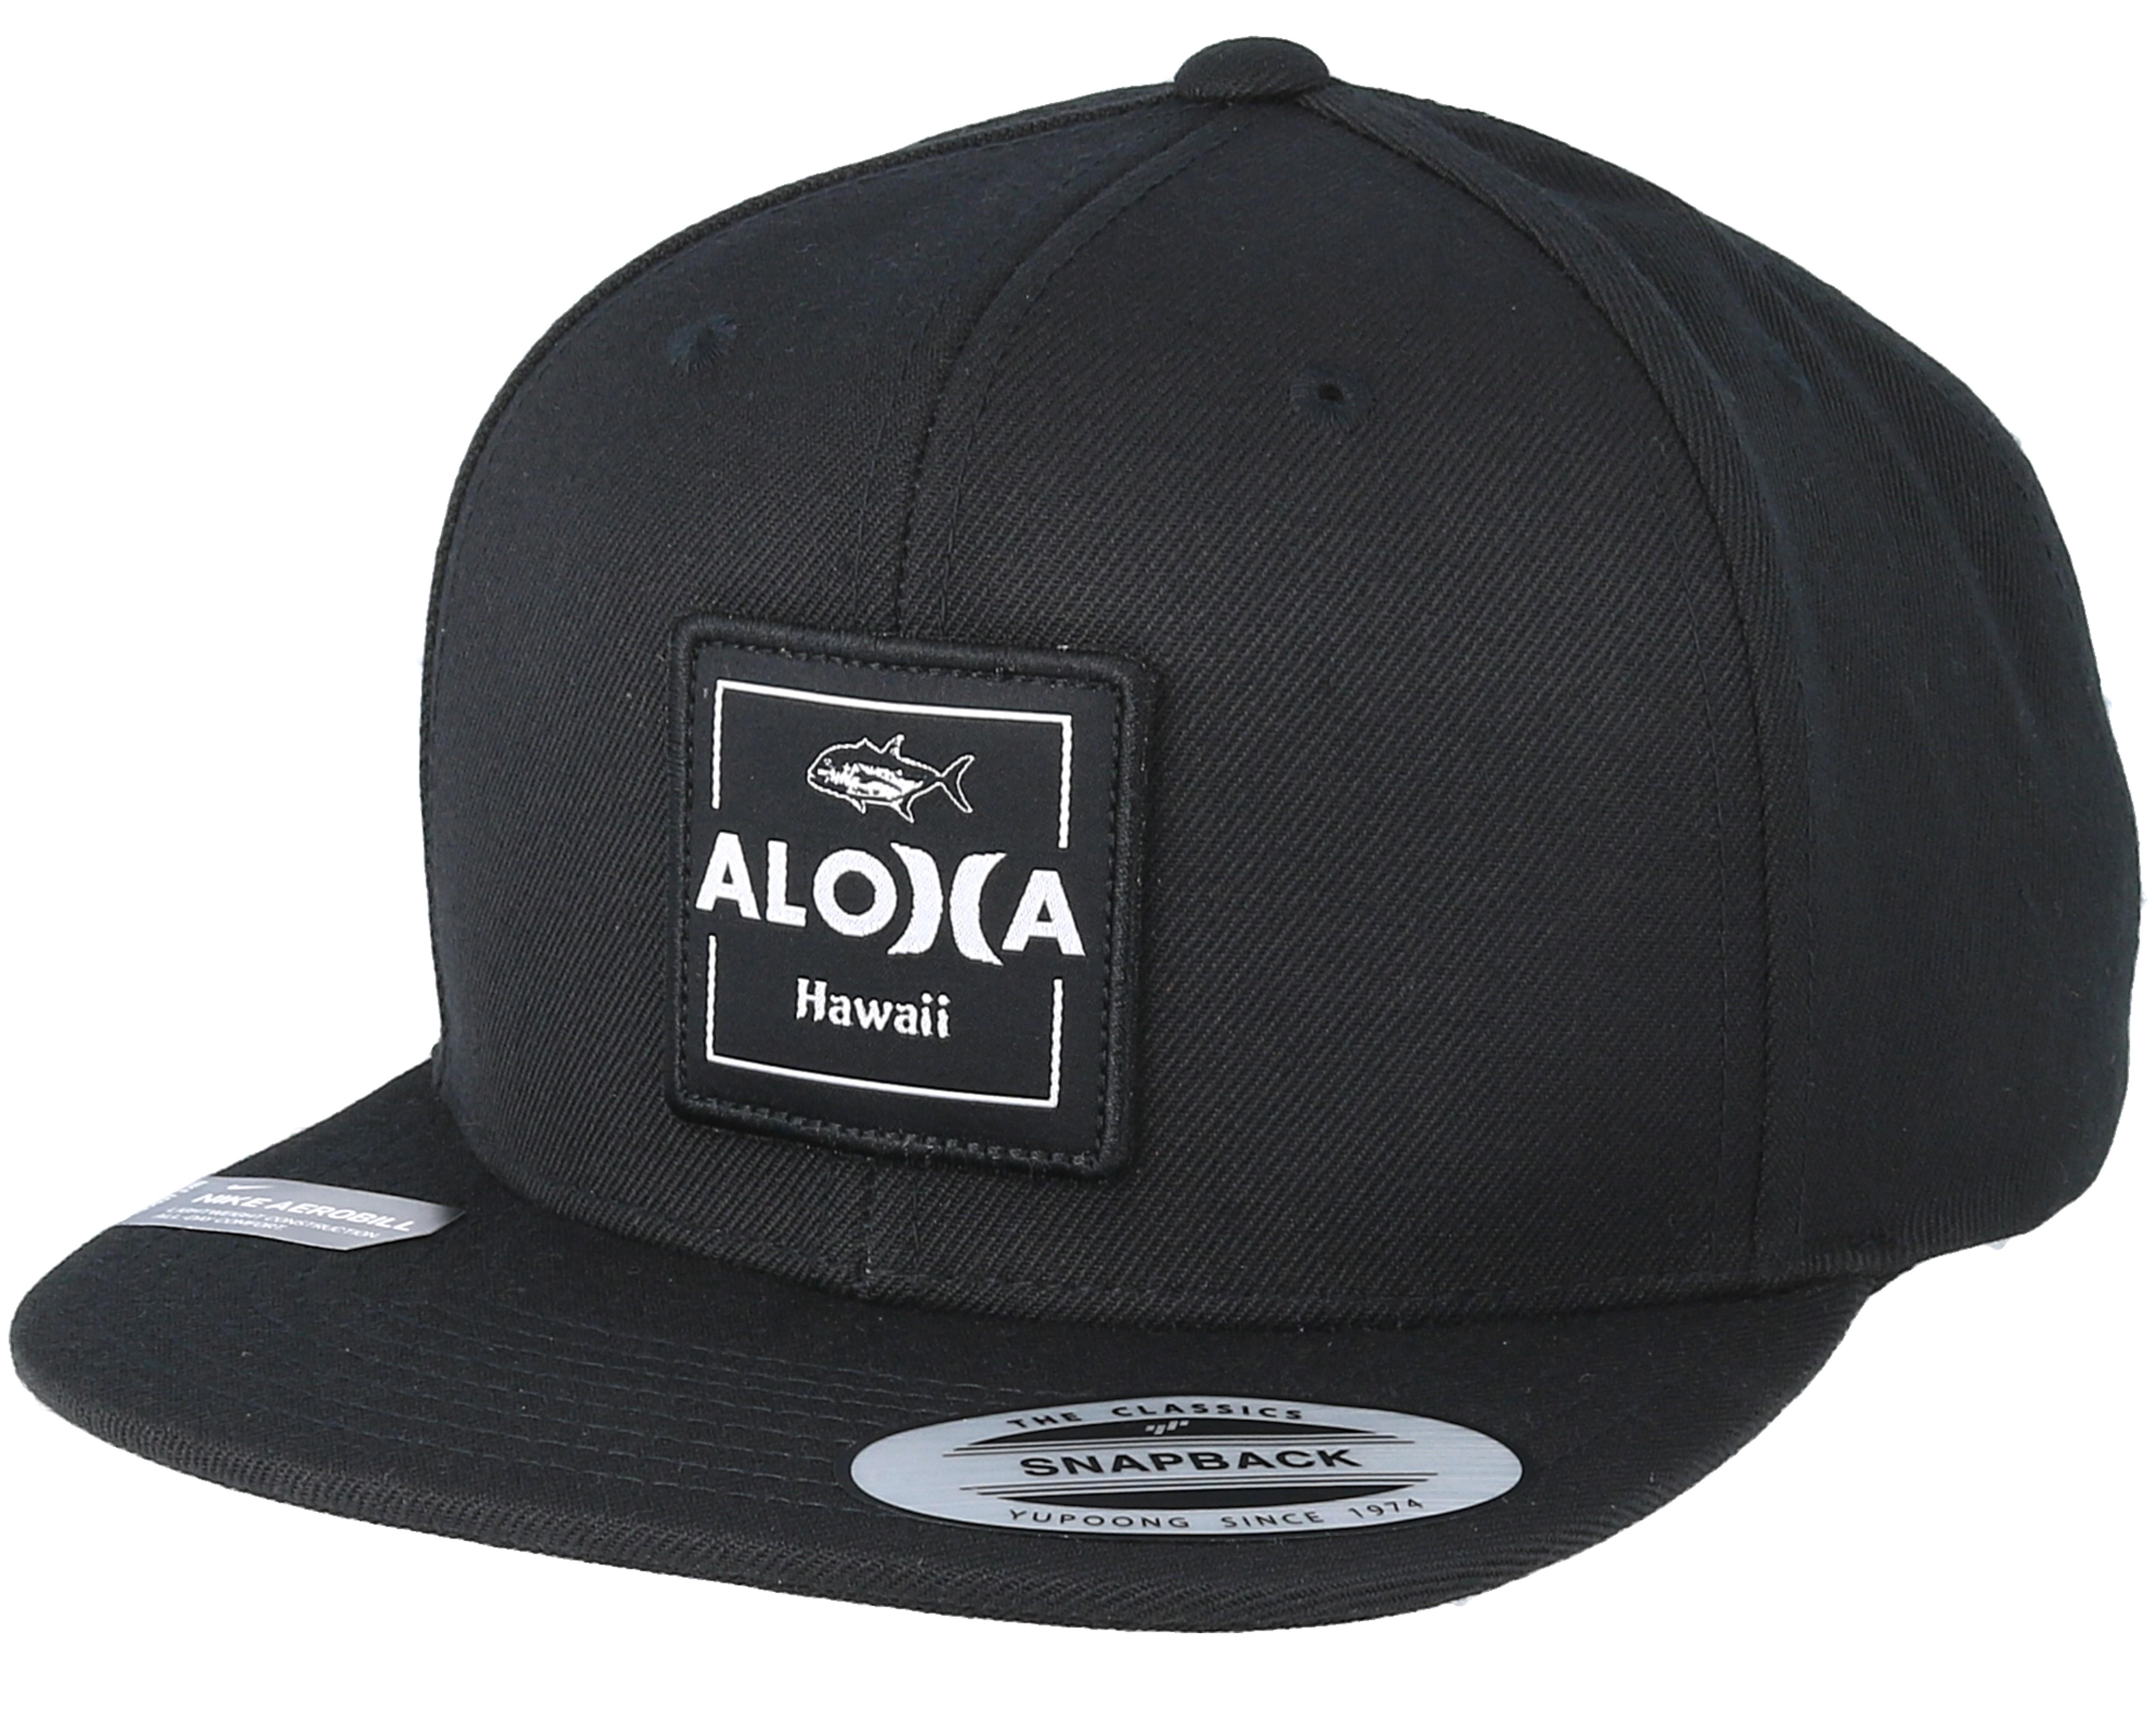 premium selection bb09c 9234c ... uk aloha cruiser black snapback hurley caps hatstore.no 1ba62 5bf26